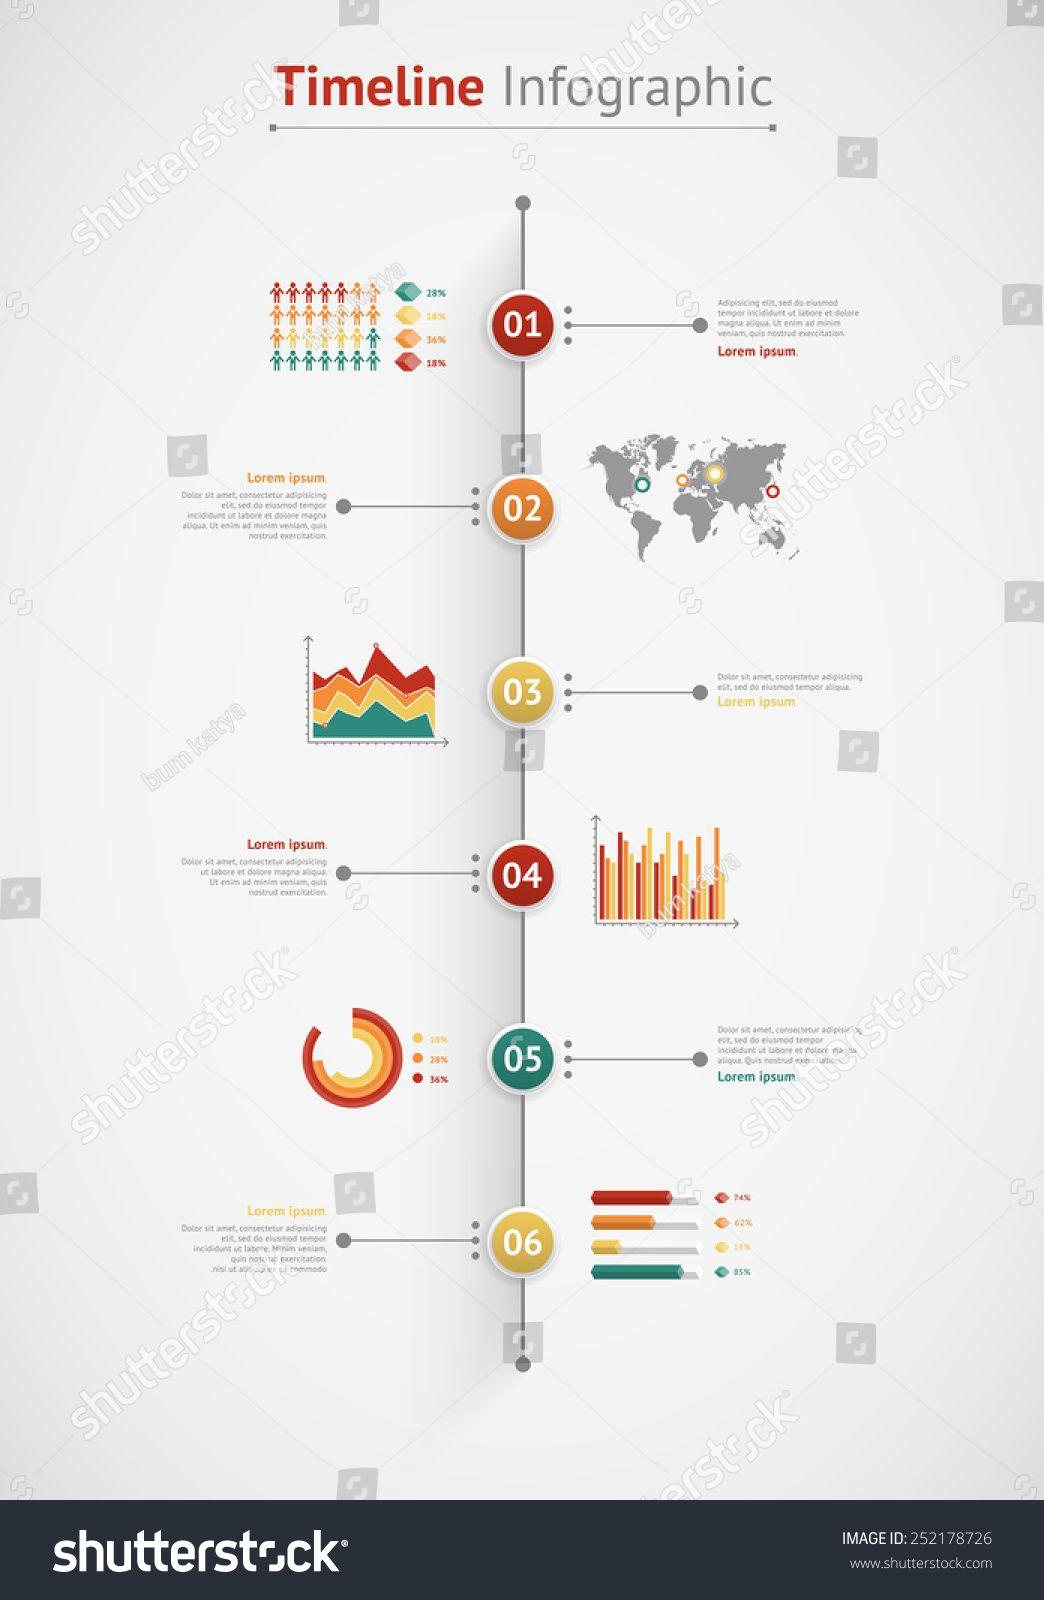 Timeline vector infographic world map timeline infographic timeline vector infographic world map gumiabroncs Images